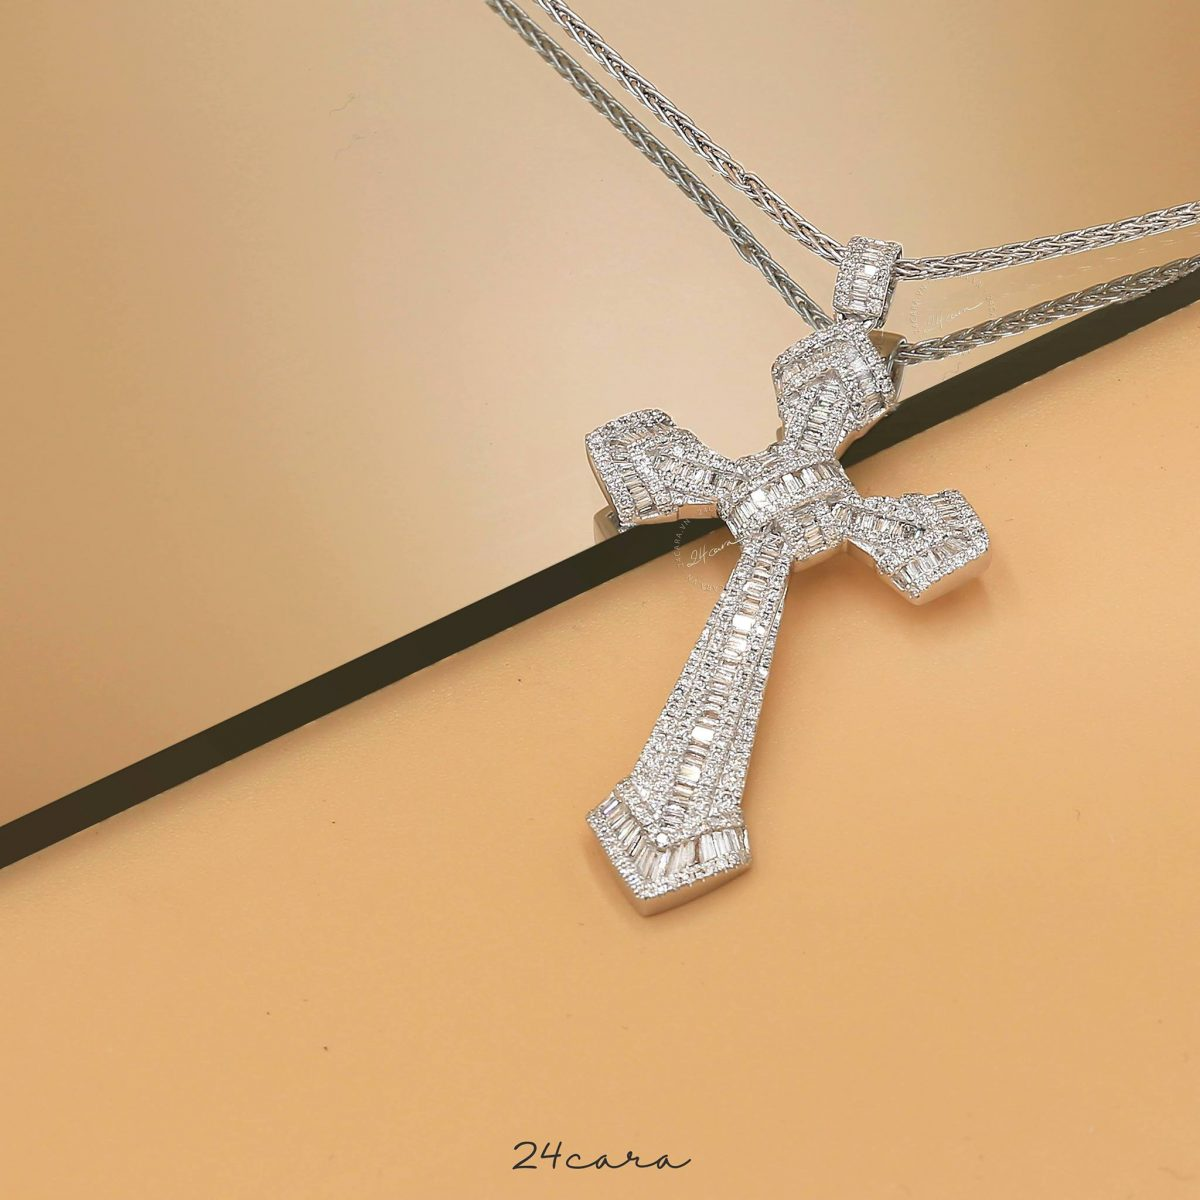 CROSS DIAMOND BAGUETTE NECKLACE - 18K WHITE GOLD